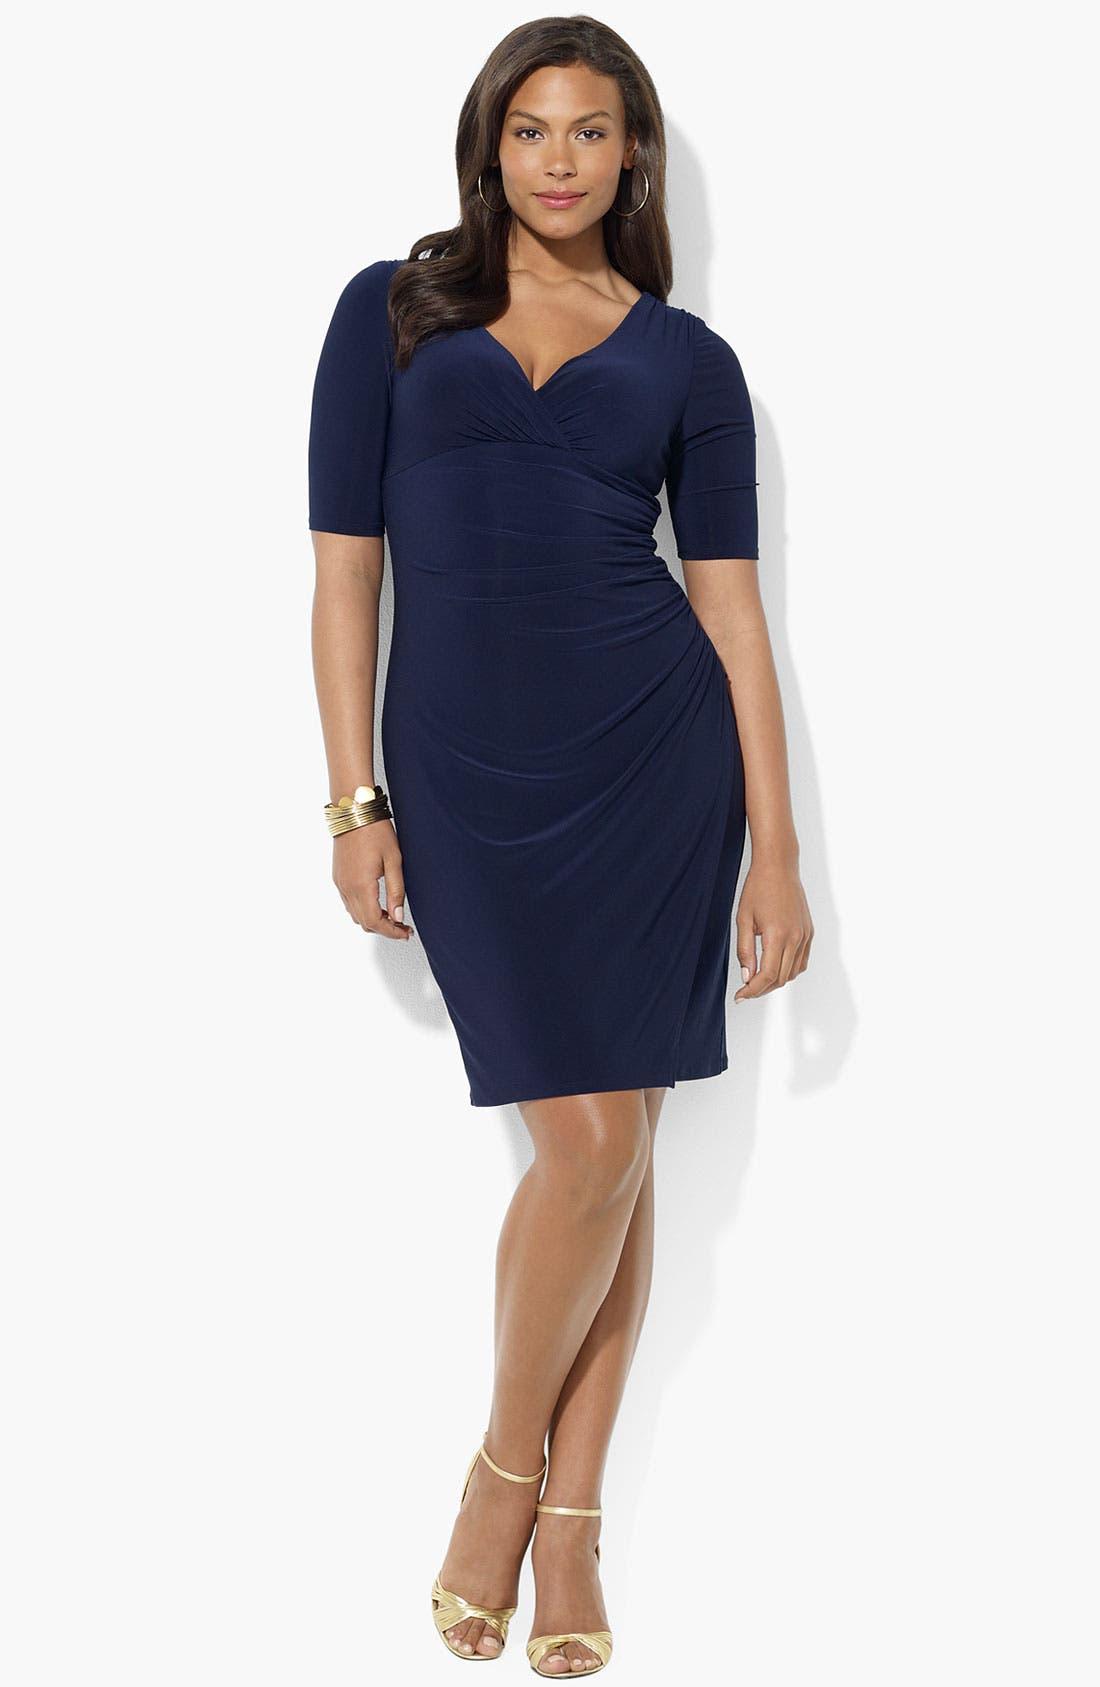 Alternate Image 1 Selected - Lauren Ralph Lauren Ruched Matte Jersey Dress (Plus)